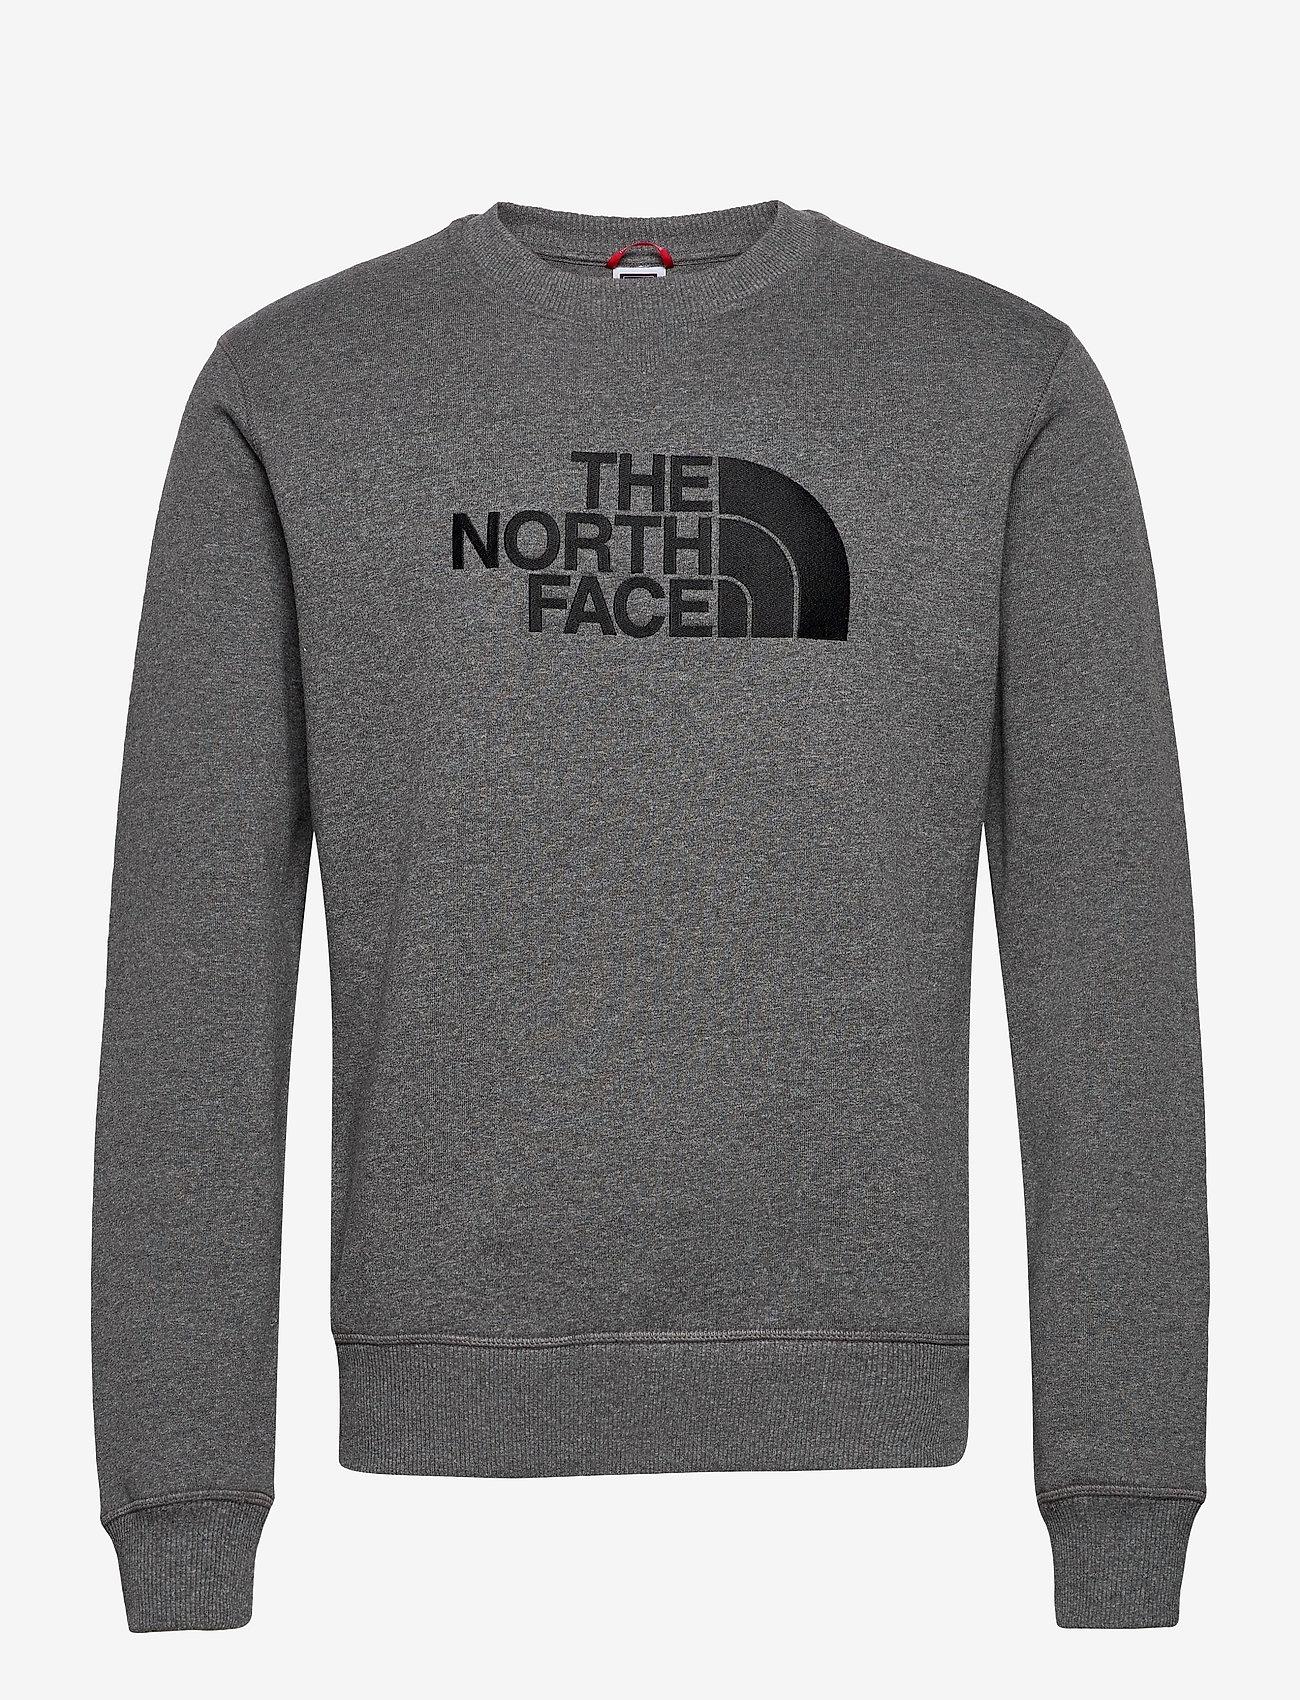 The North Face - M DREW PEAK CREW - sweats - tnfmdgyhr/tnfbk - 0